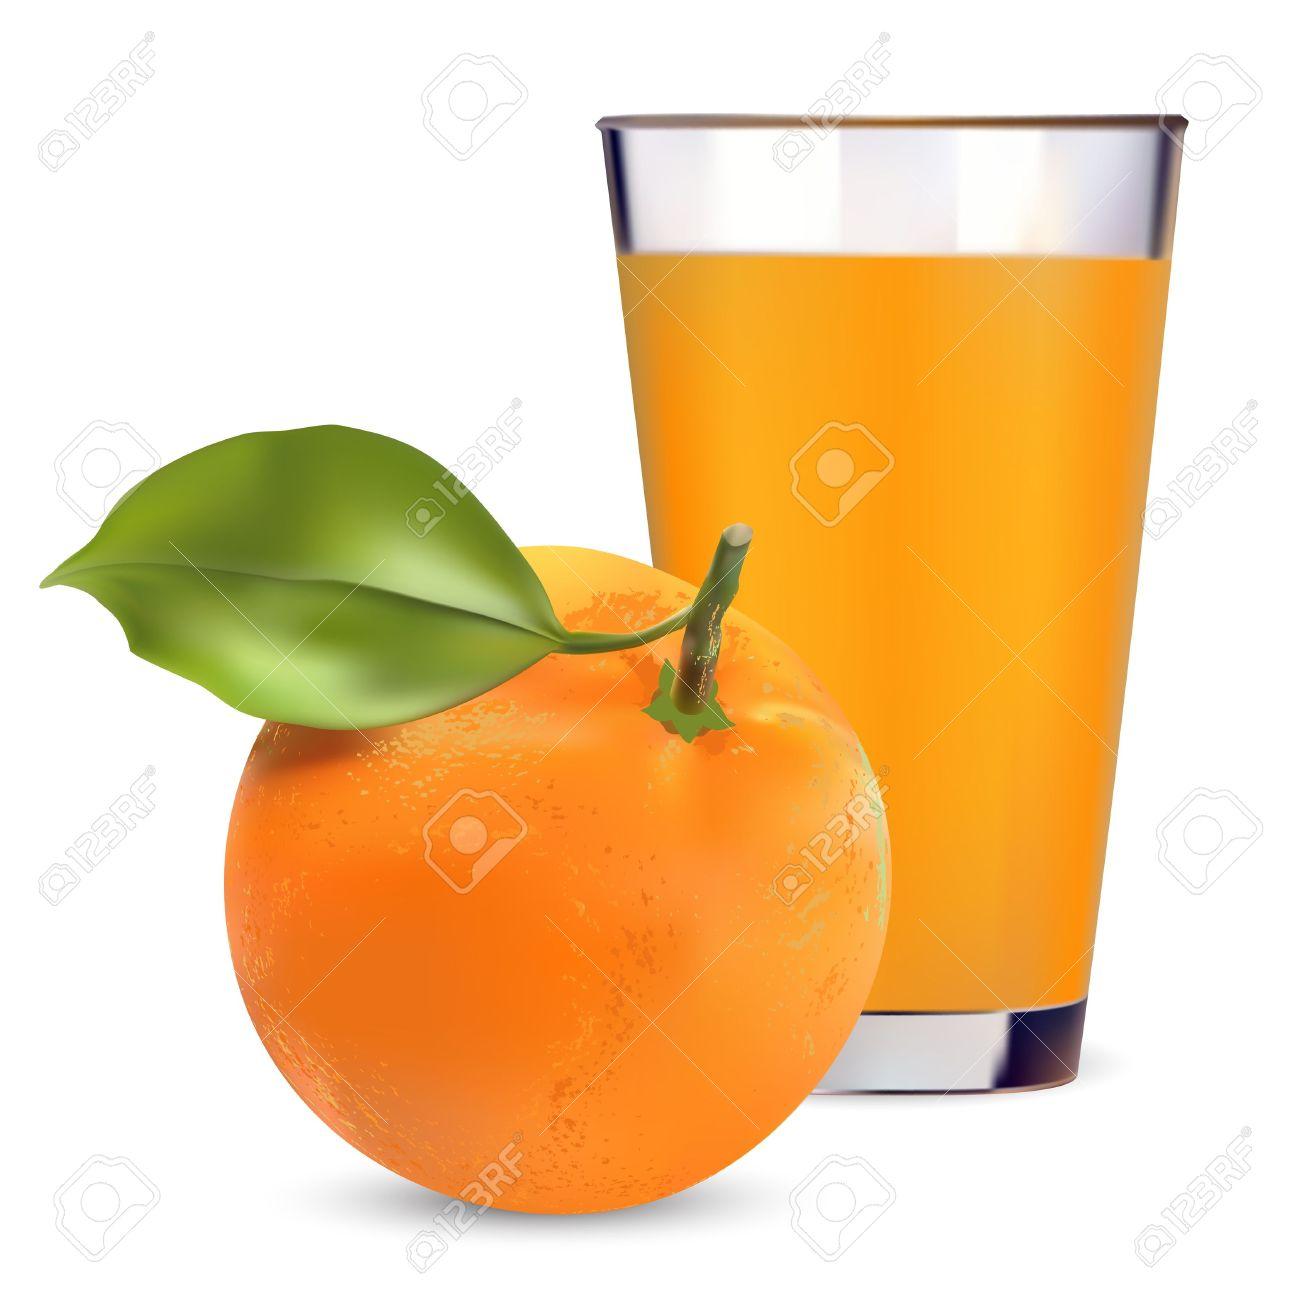 Oranges And Orange Juice On White Background Royalty Free Cliparts.